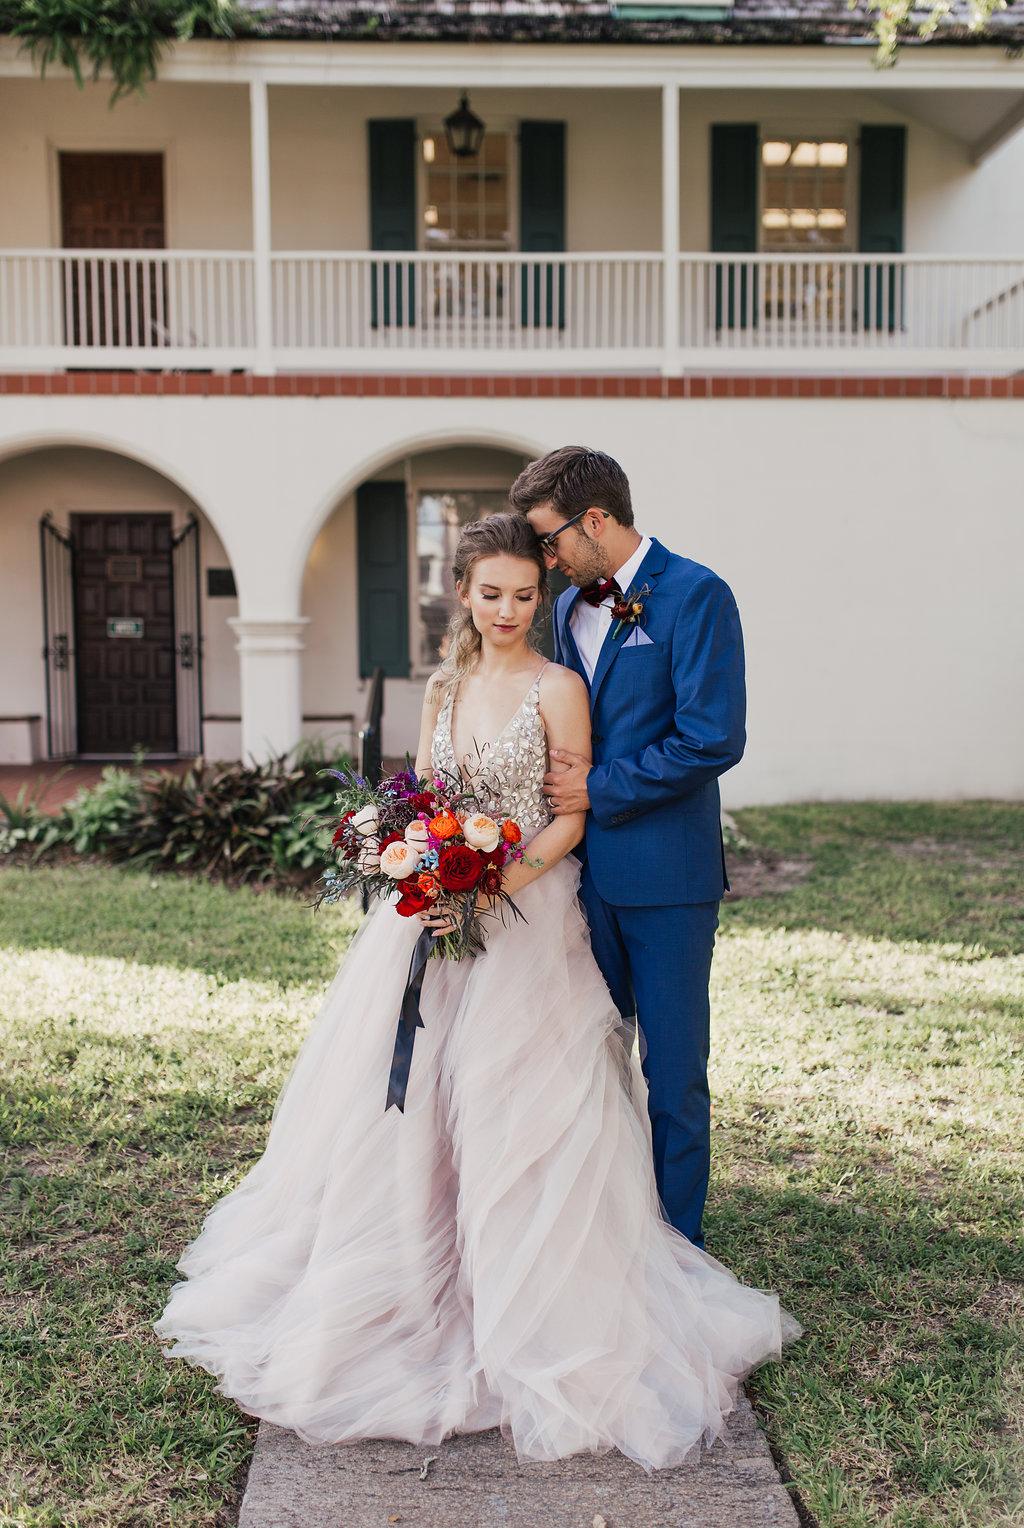 romantic wedding inspiration shoots - photo by Alondra Vega Photography https://ruffledblog.com/jewel-toned-wedding-ideas-with-a-surprise-proposal